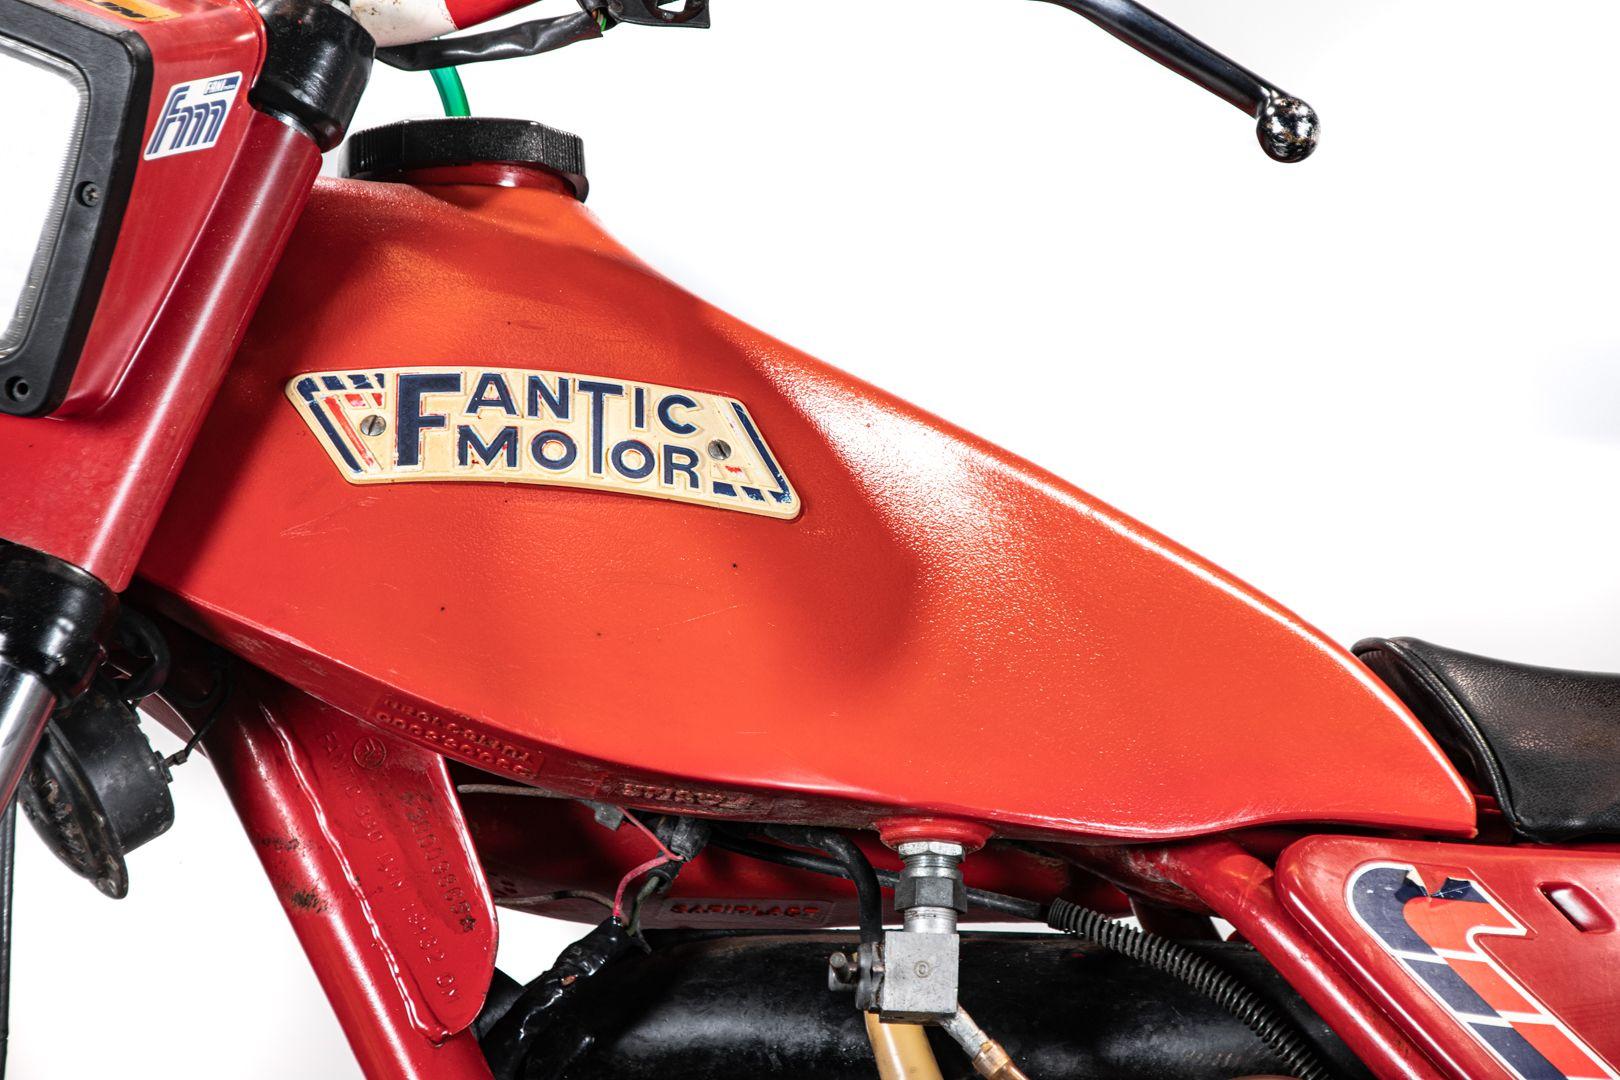 1984 Fantic Motor Trial 50 330 66845